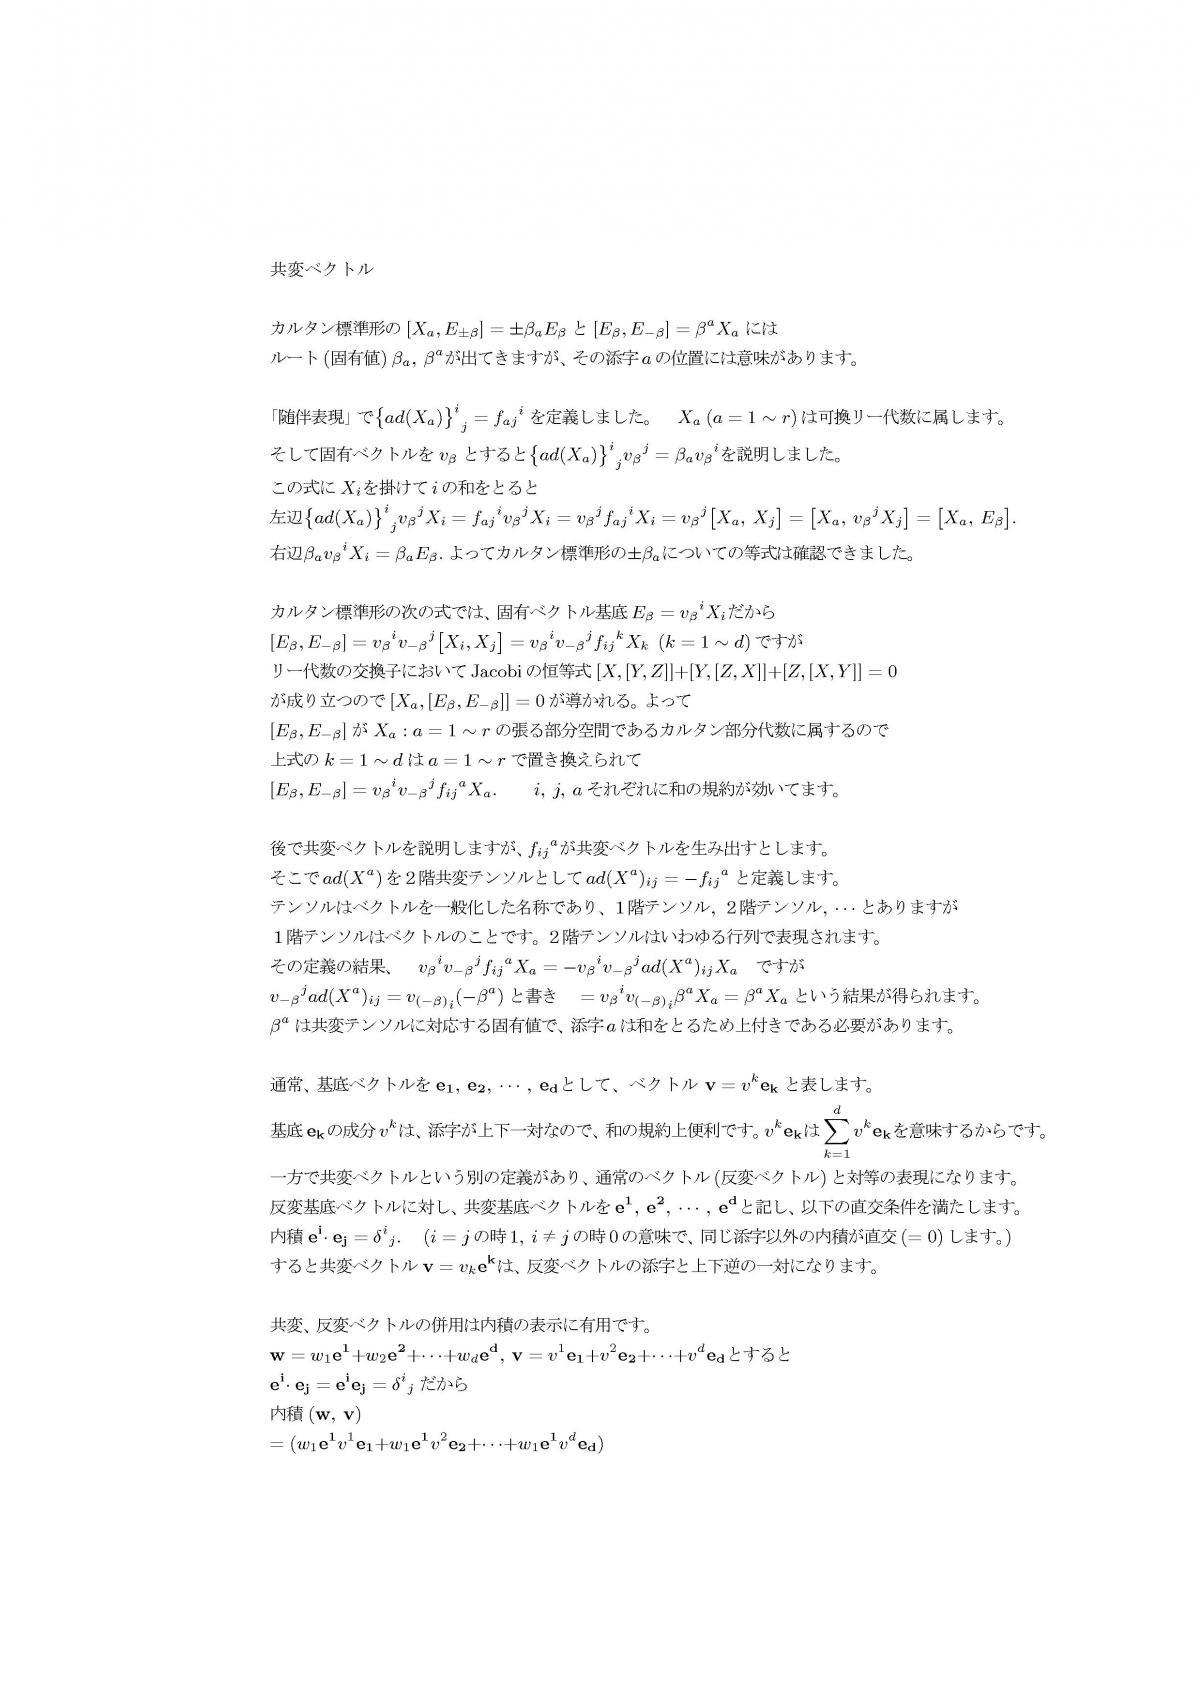 grp130822a.jpg